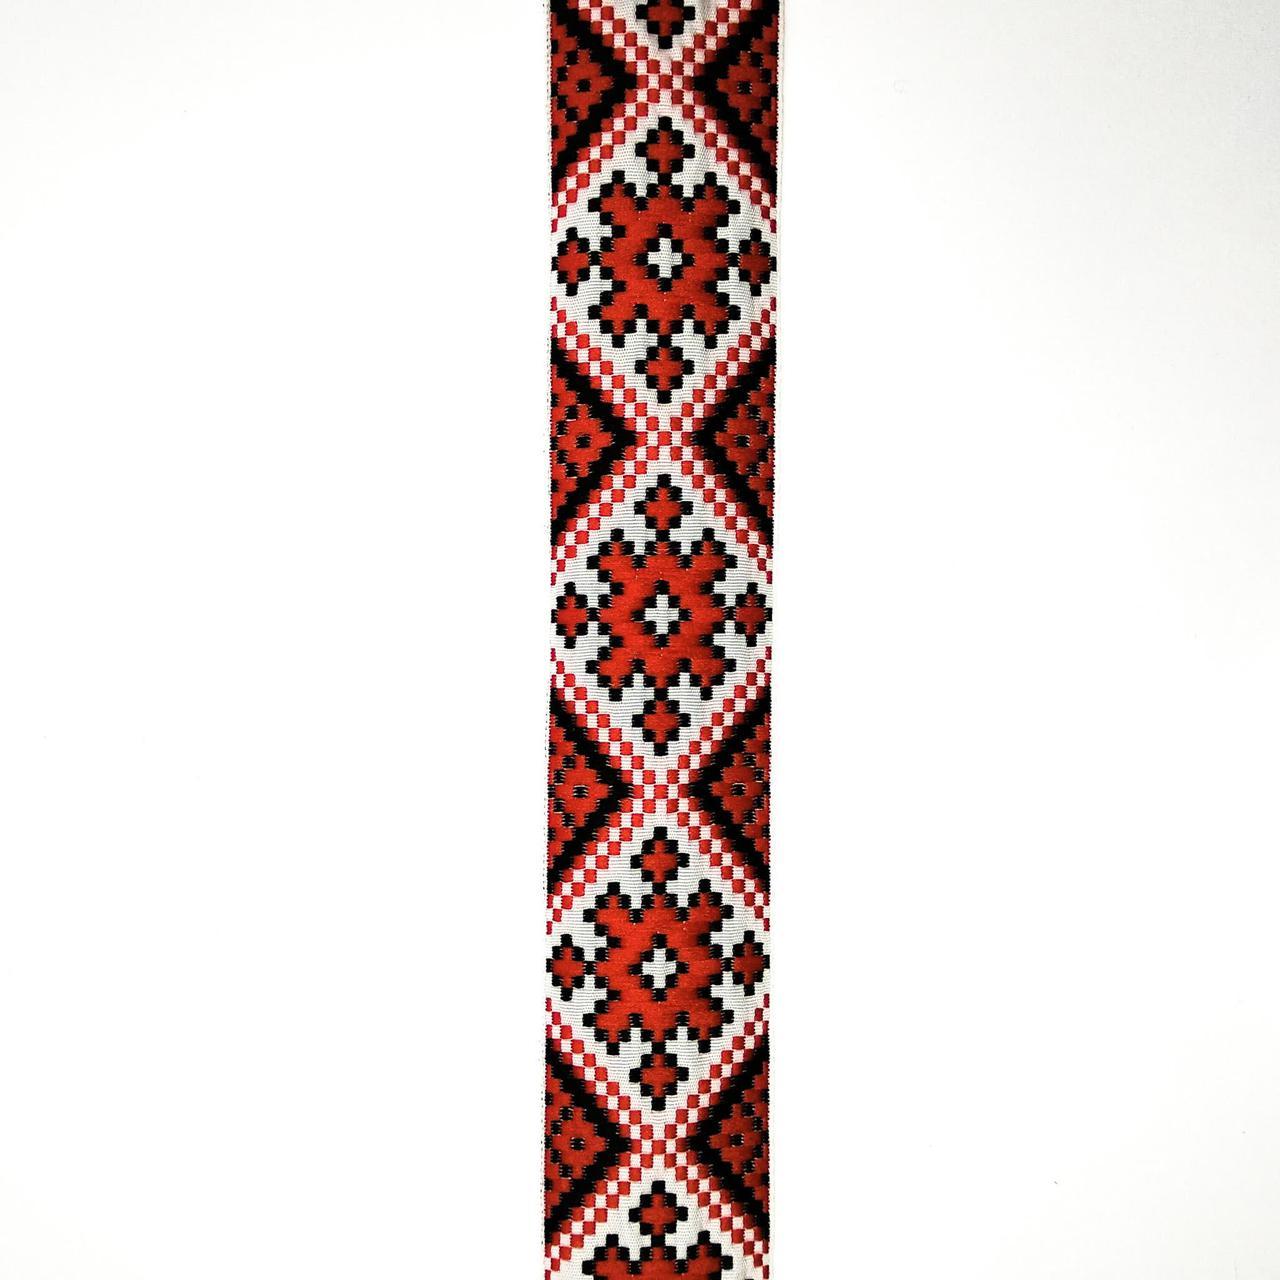 Лента отделочная с украинским орнаментом 32 мм (25м/рулон)